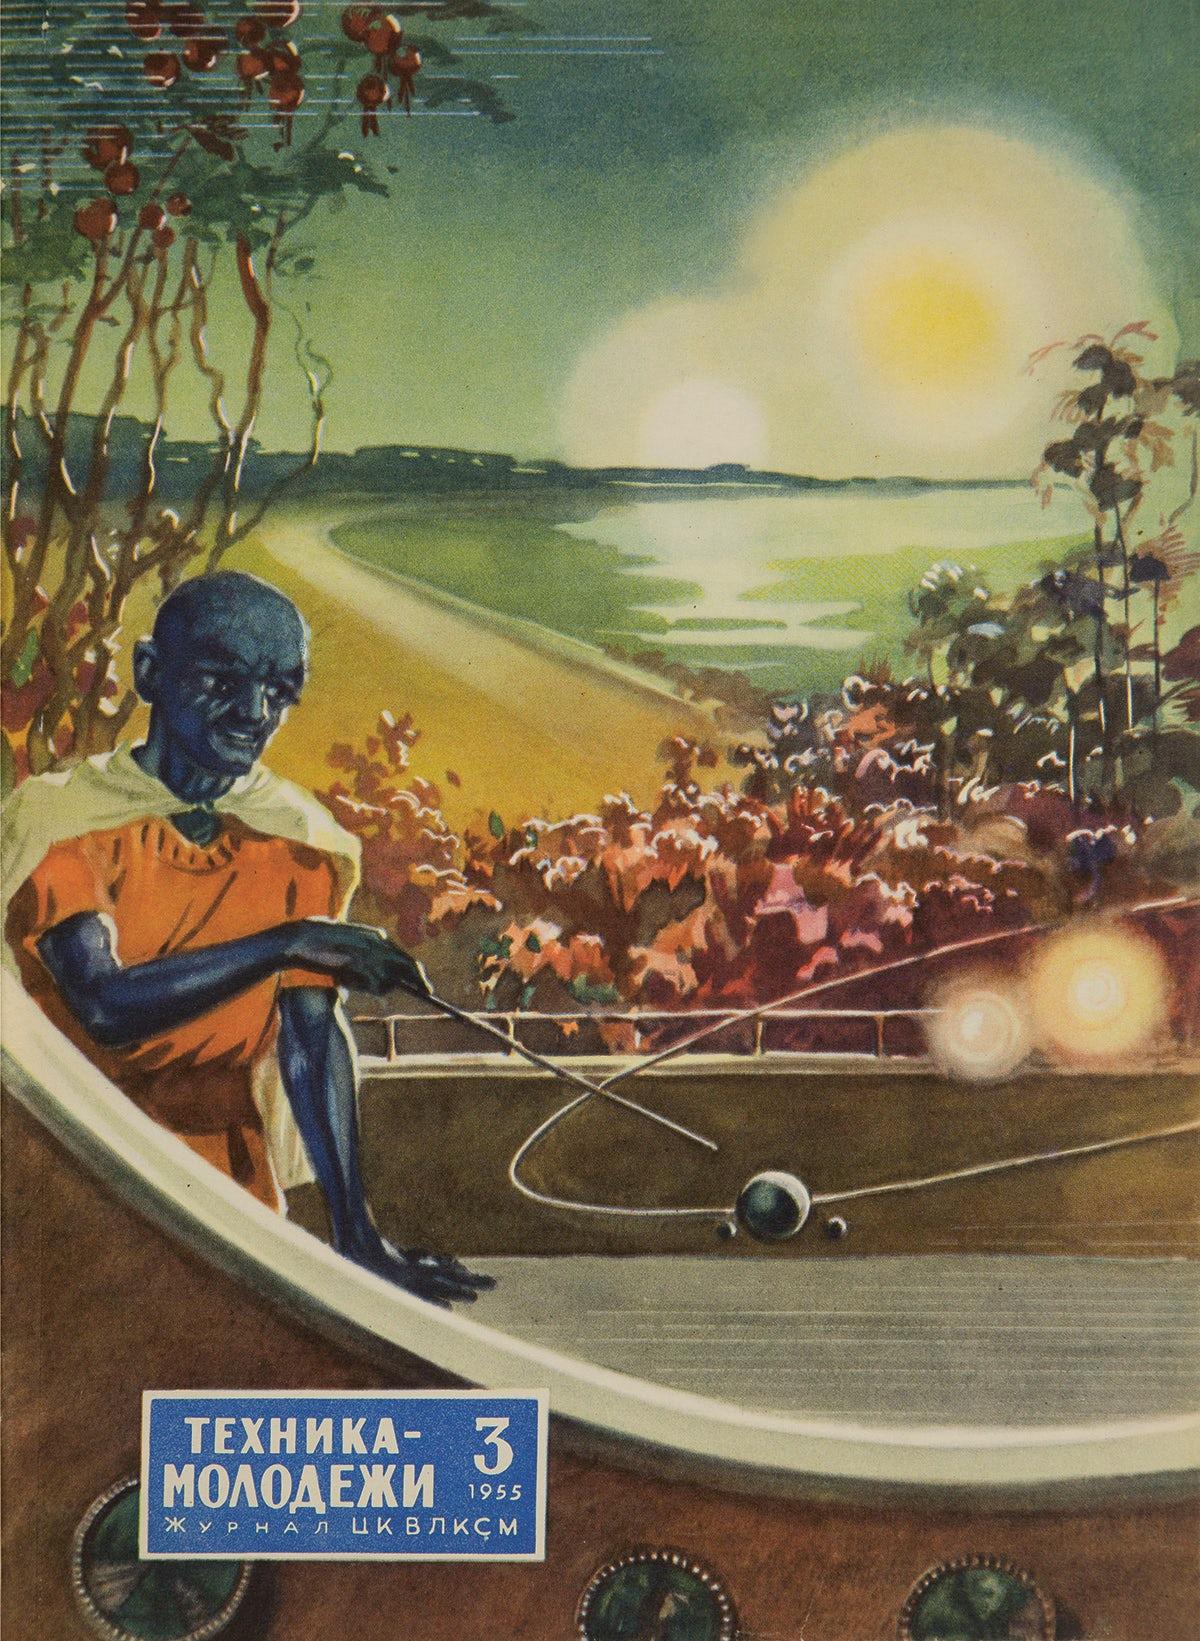 A voyage into Soviet-era space graphics